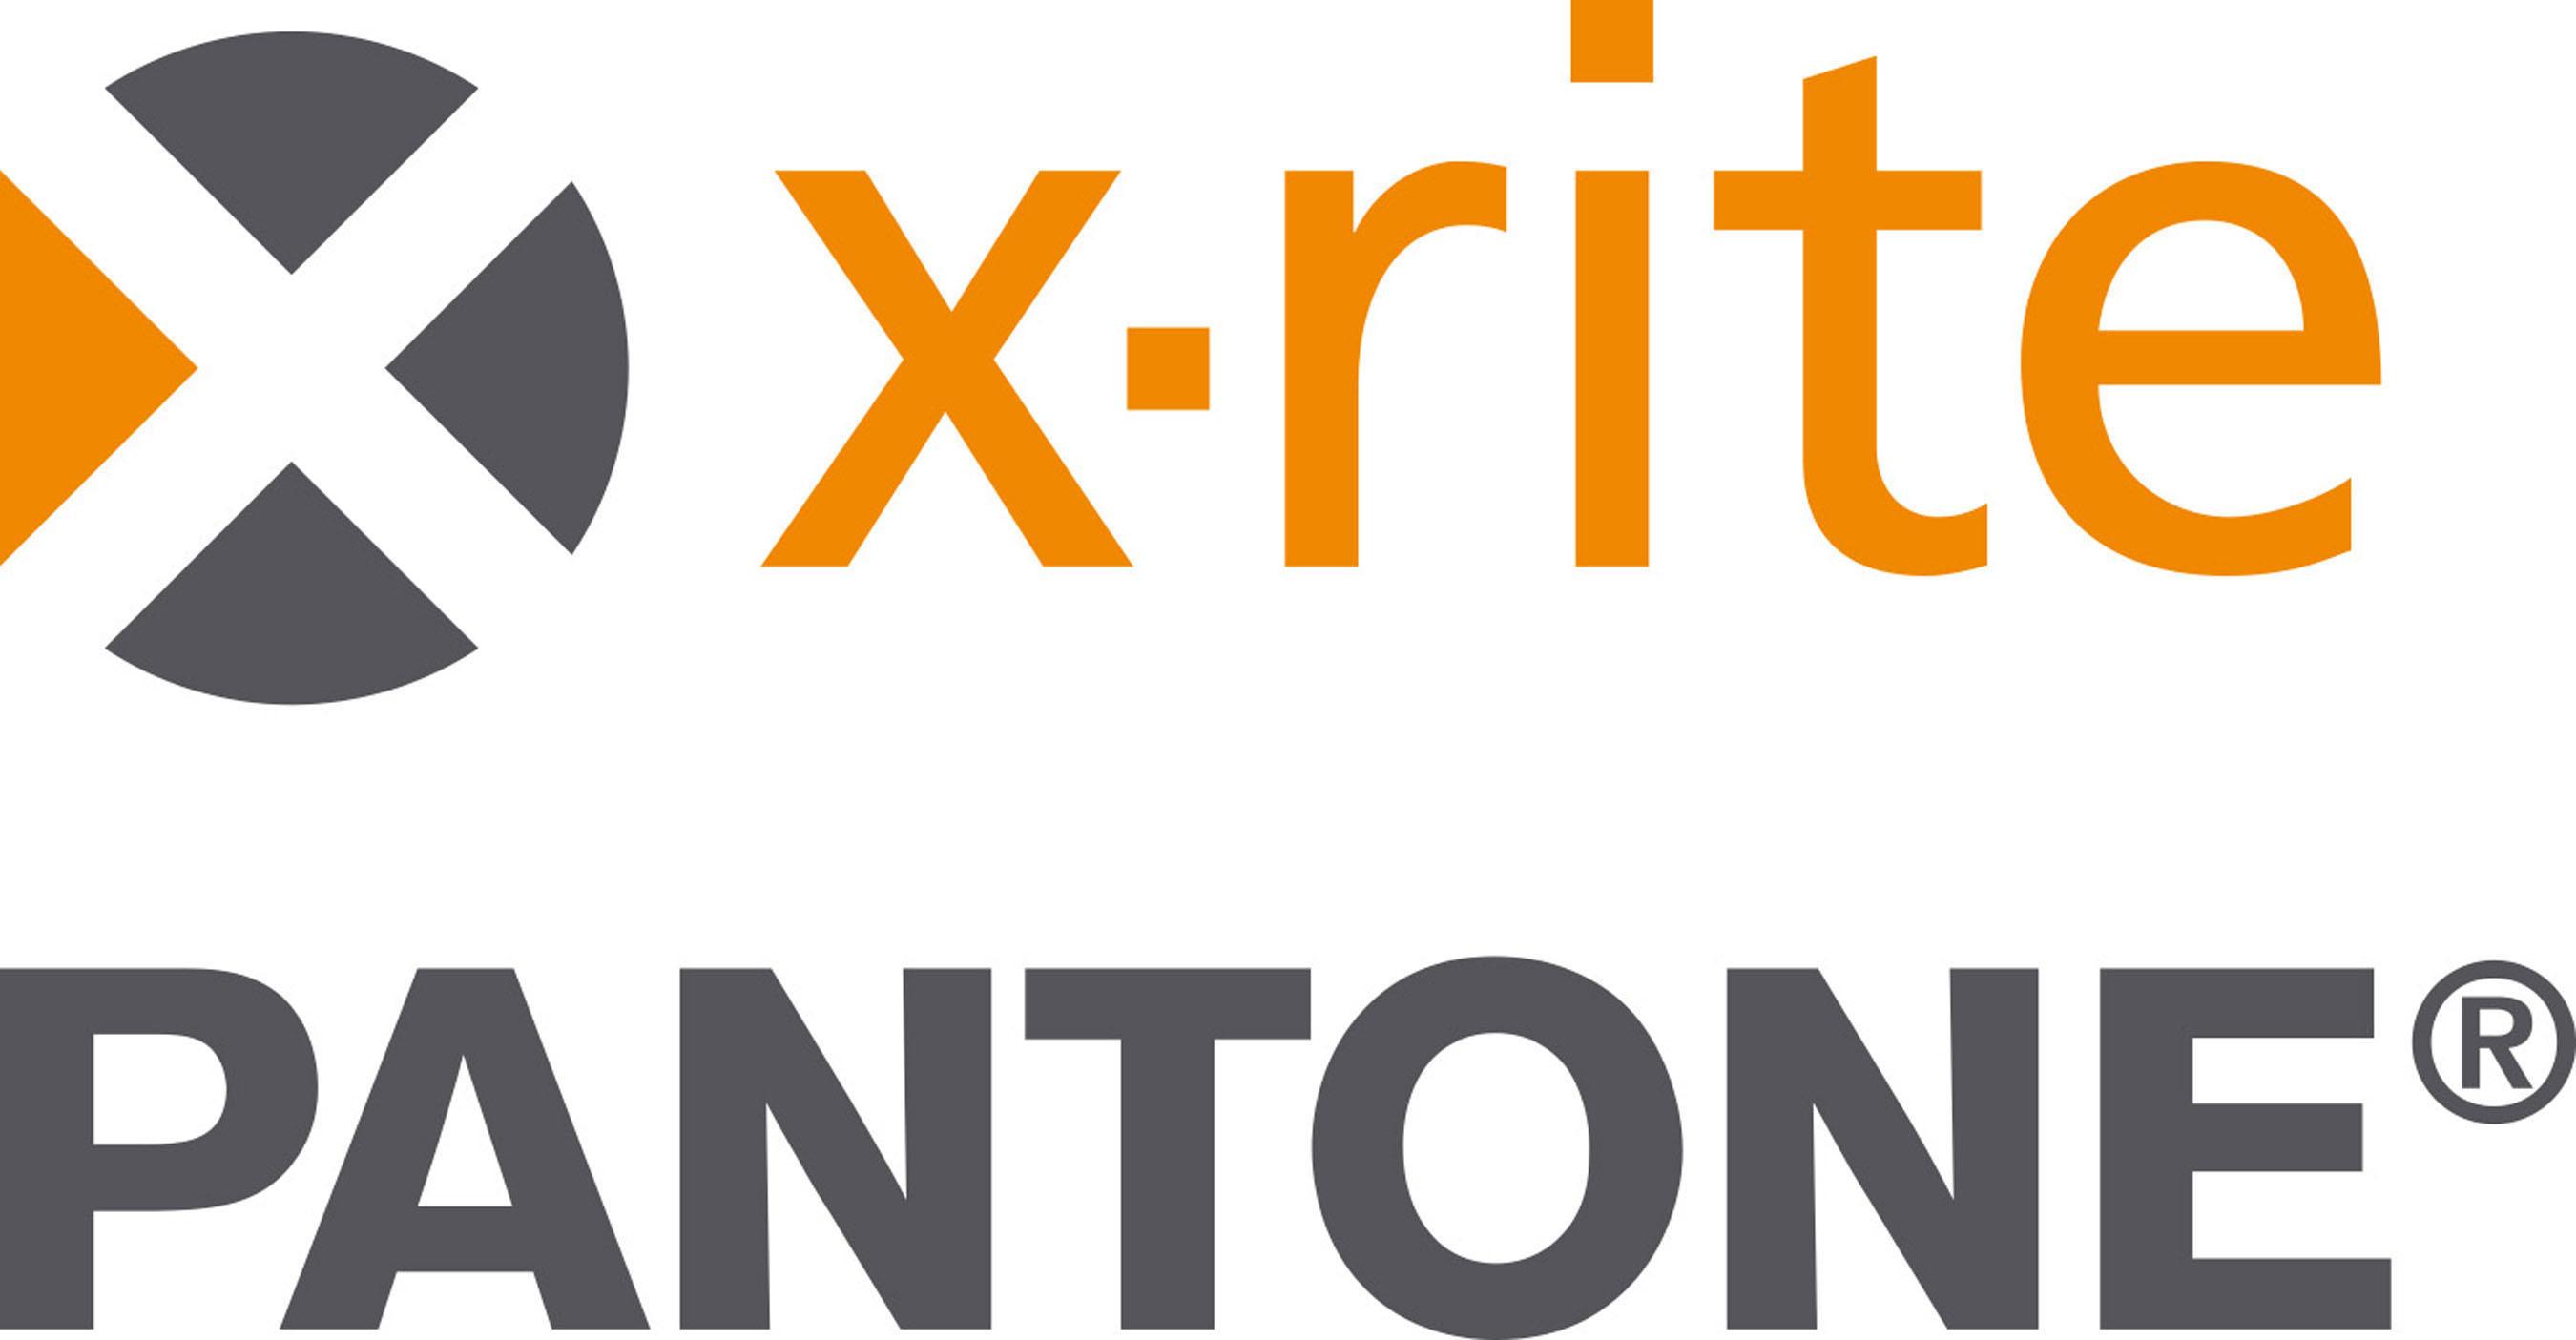 Pantone, an X-Rite company.